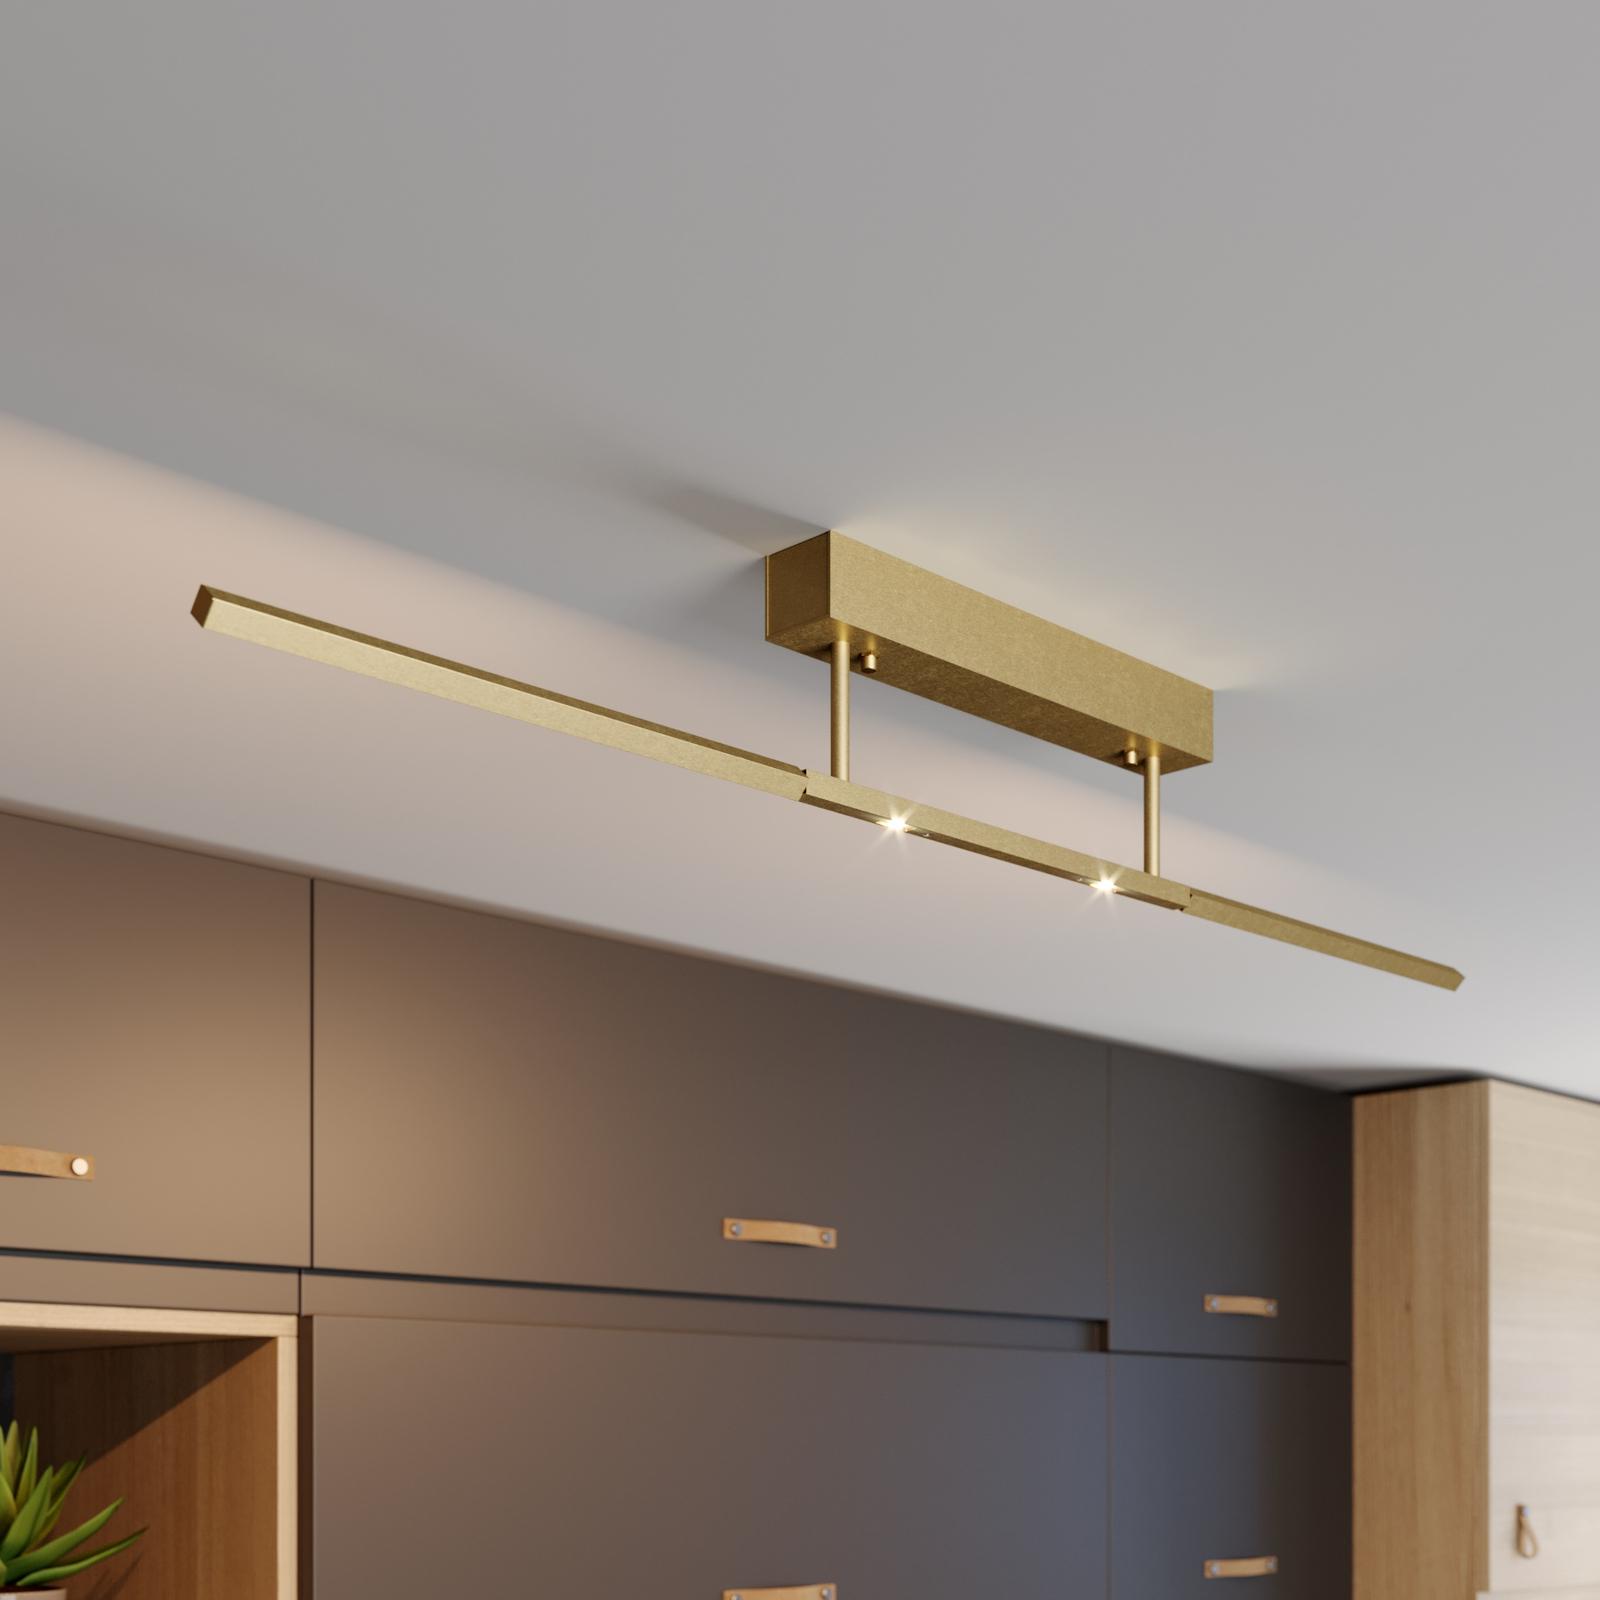 Lucande LED-Deckenleuchte Tolu, messing, 119 cm